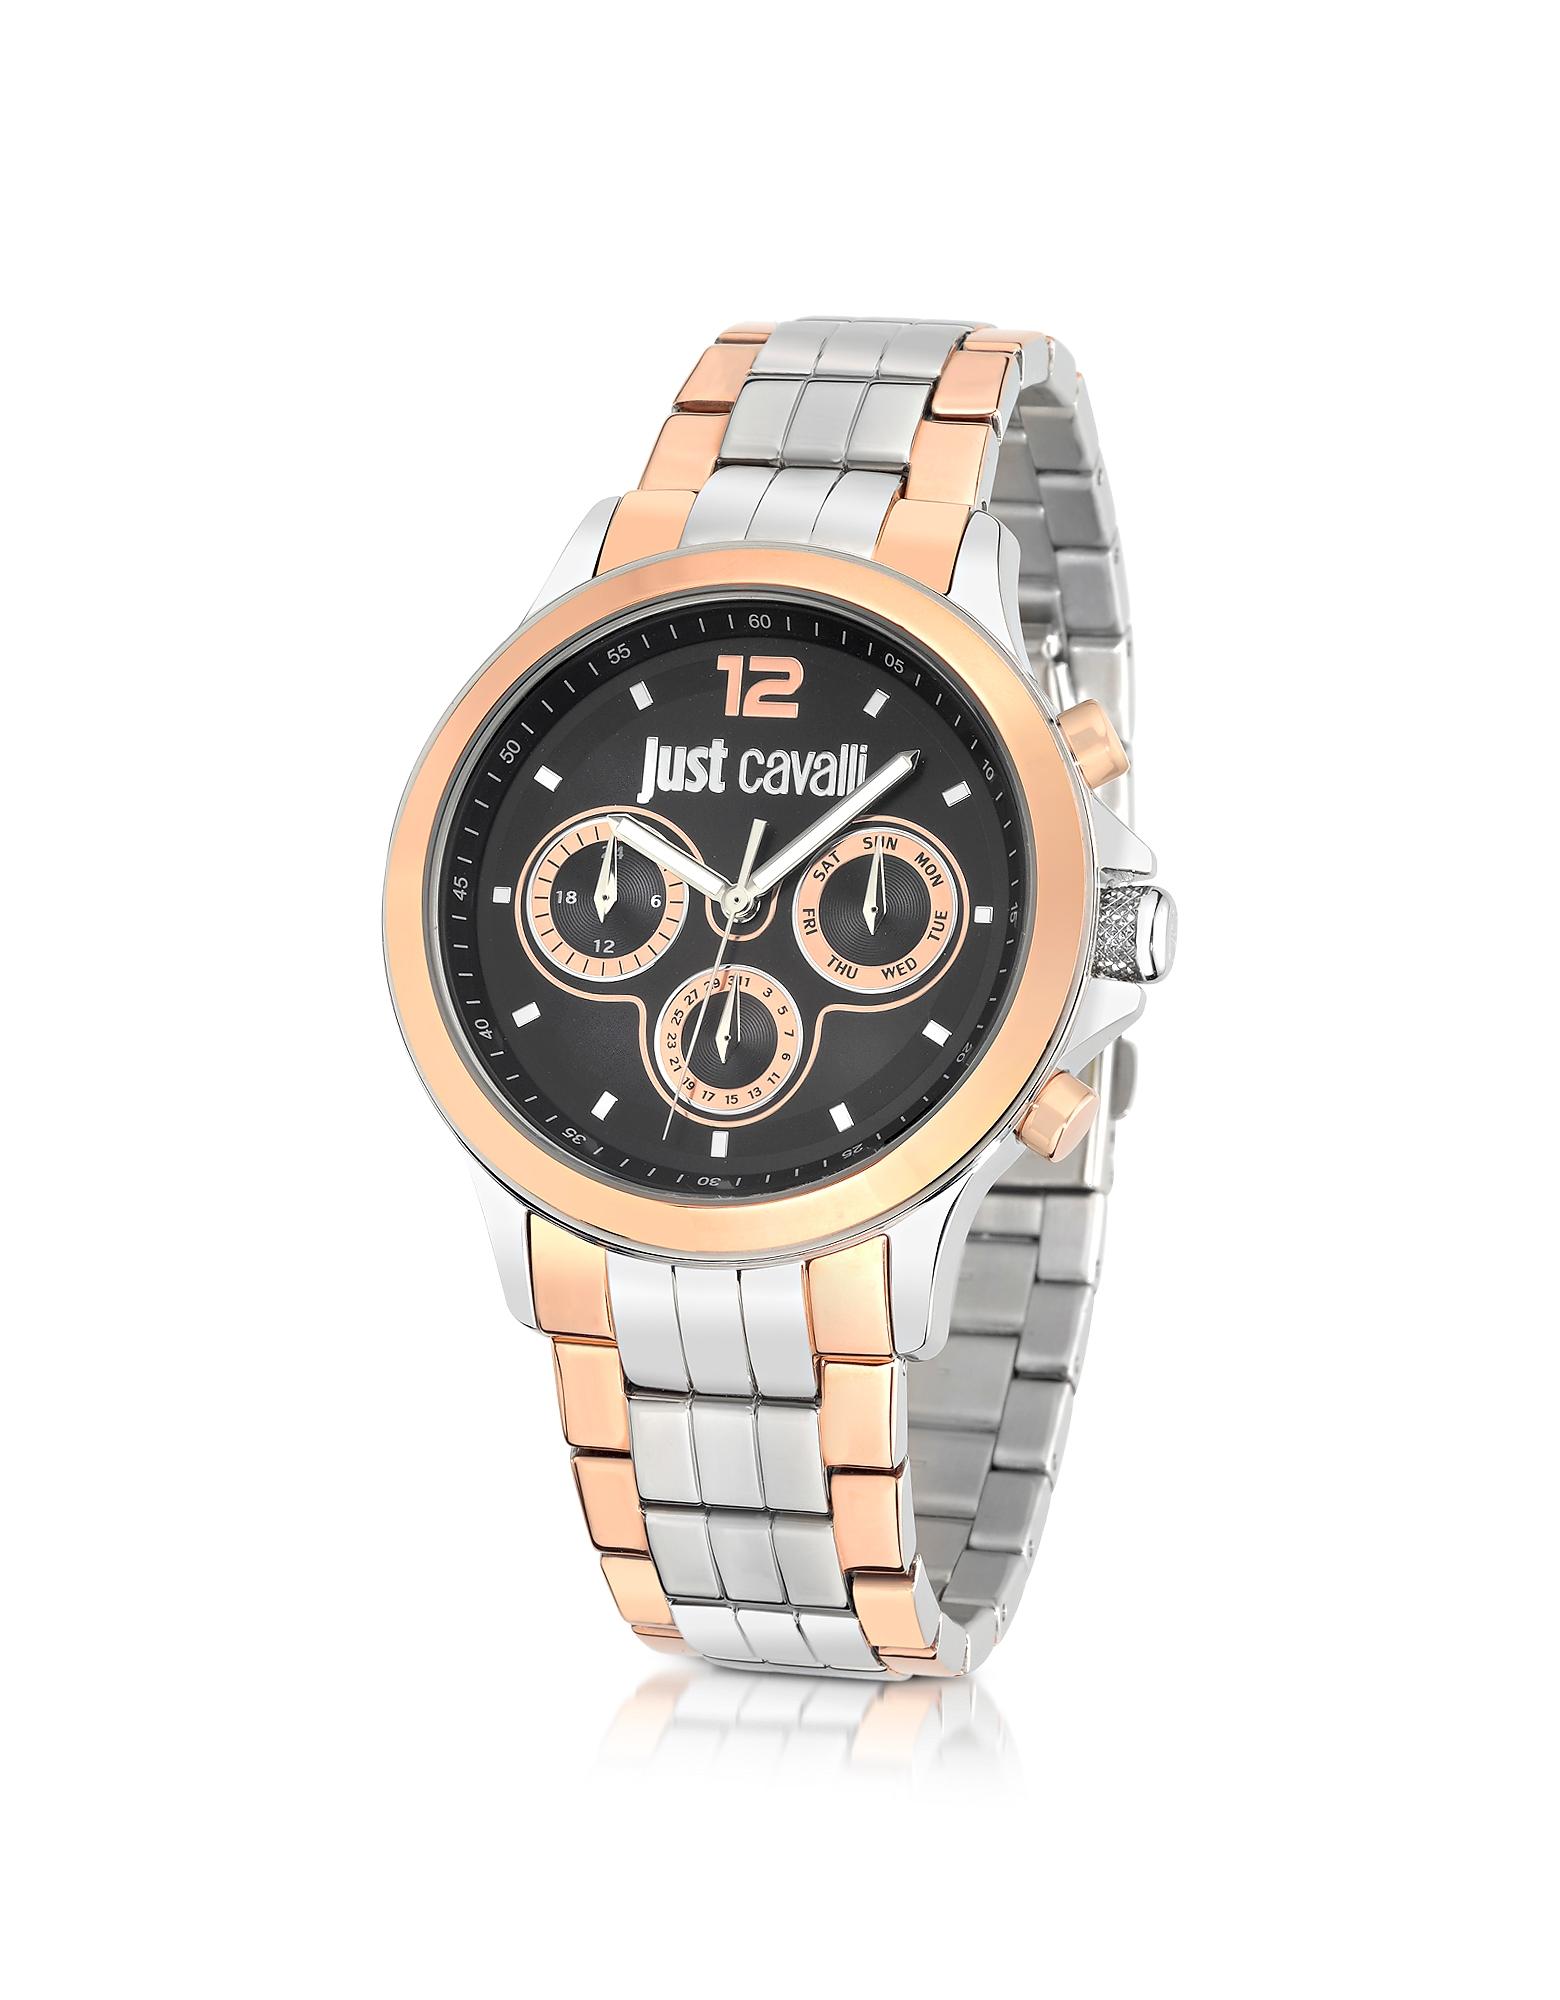 Just Cavalli Men's Watches, Just Iron Stainless Steel Men's Watch